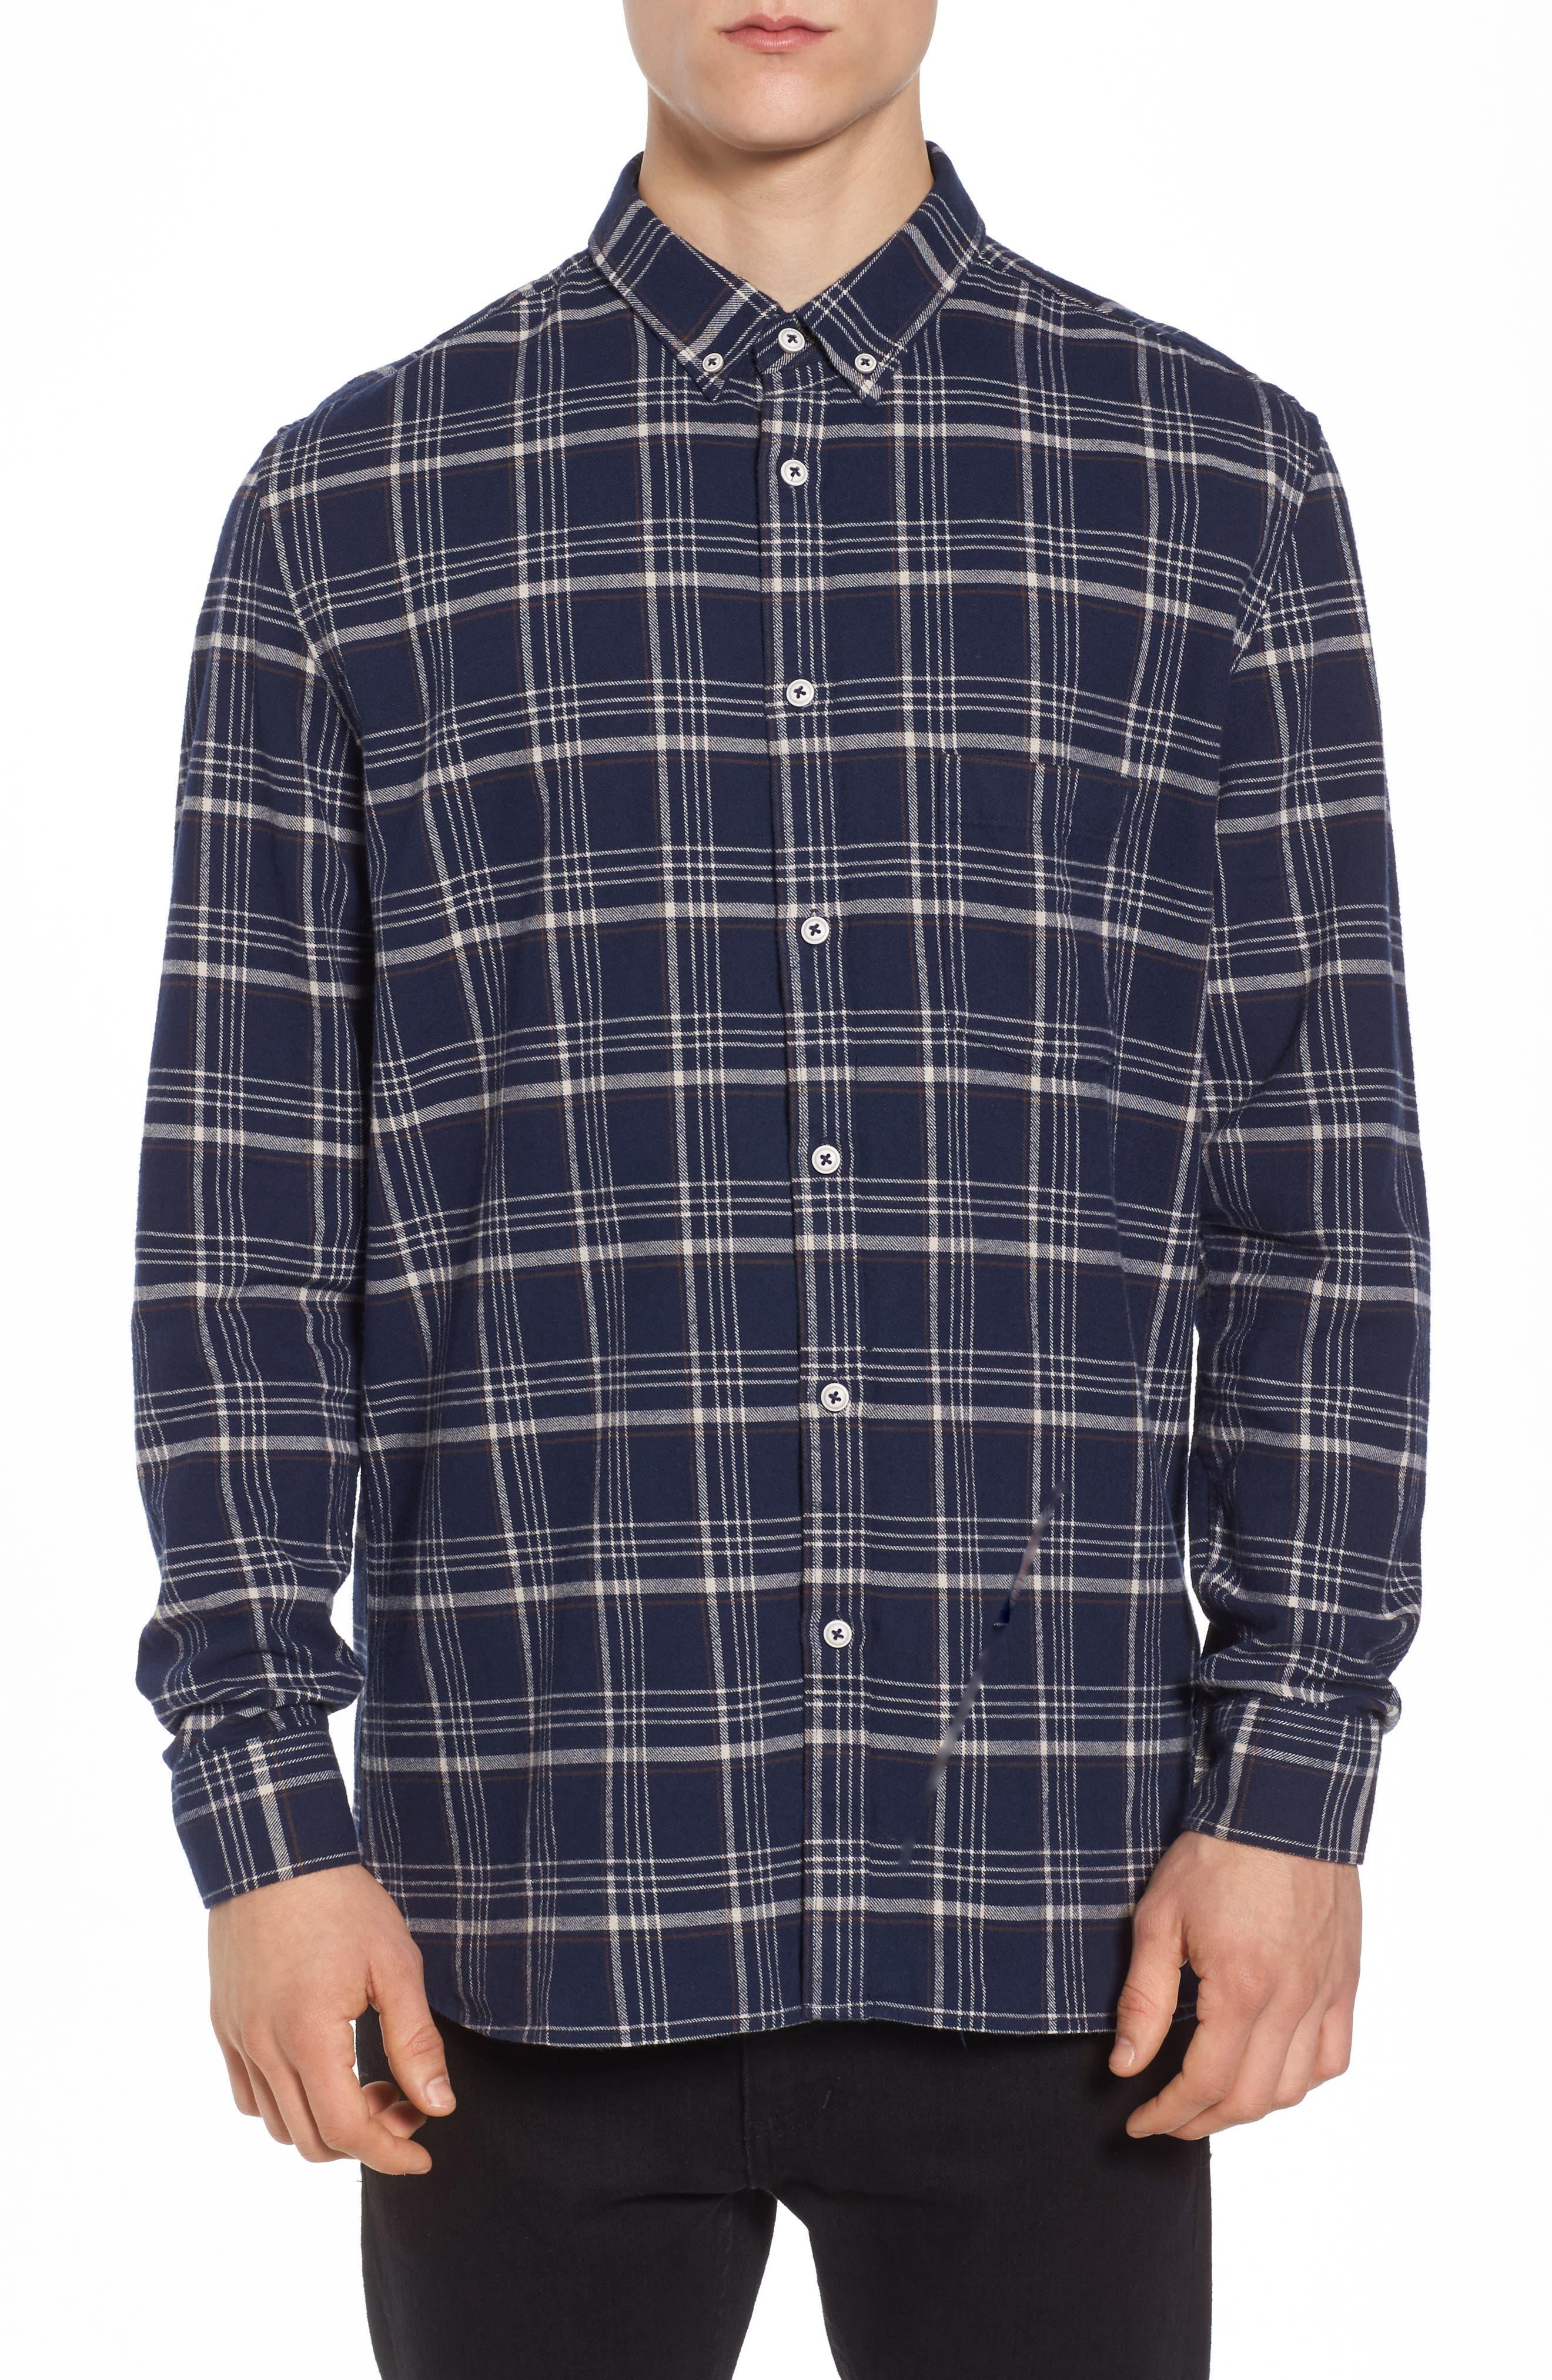 Cabin Plaid Shirt,                         Main,                         color, Navy Plaid